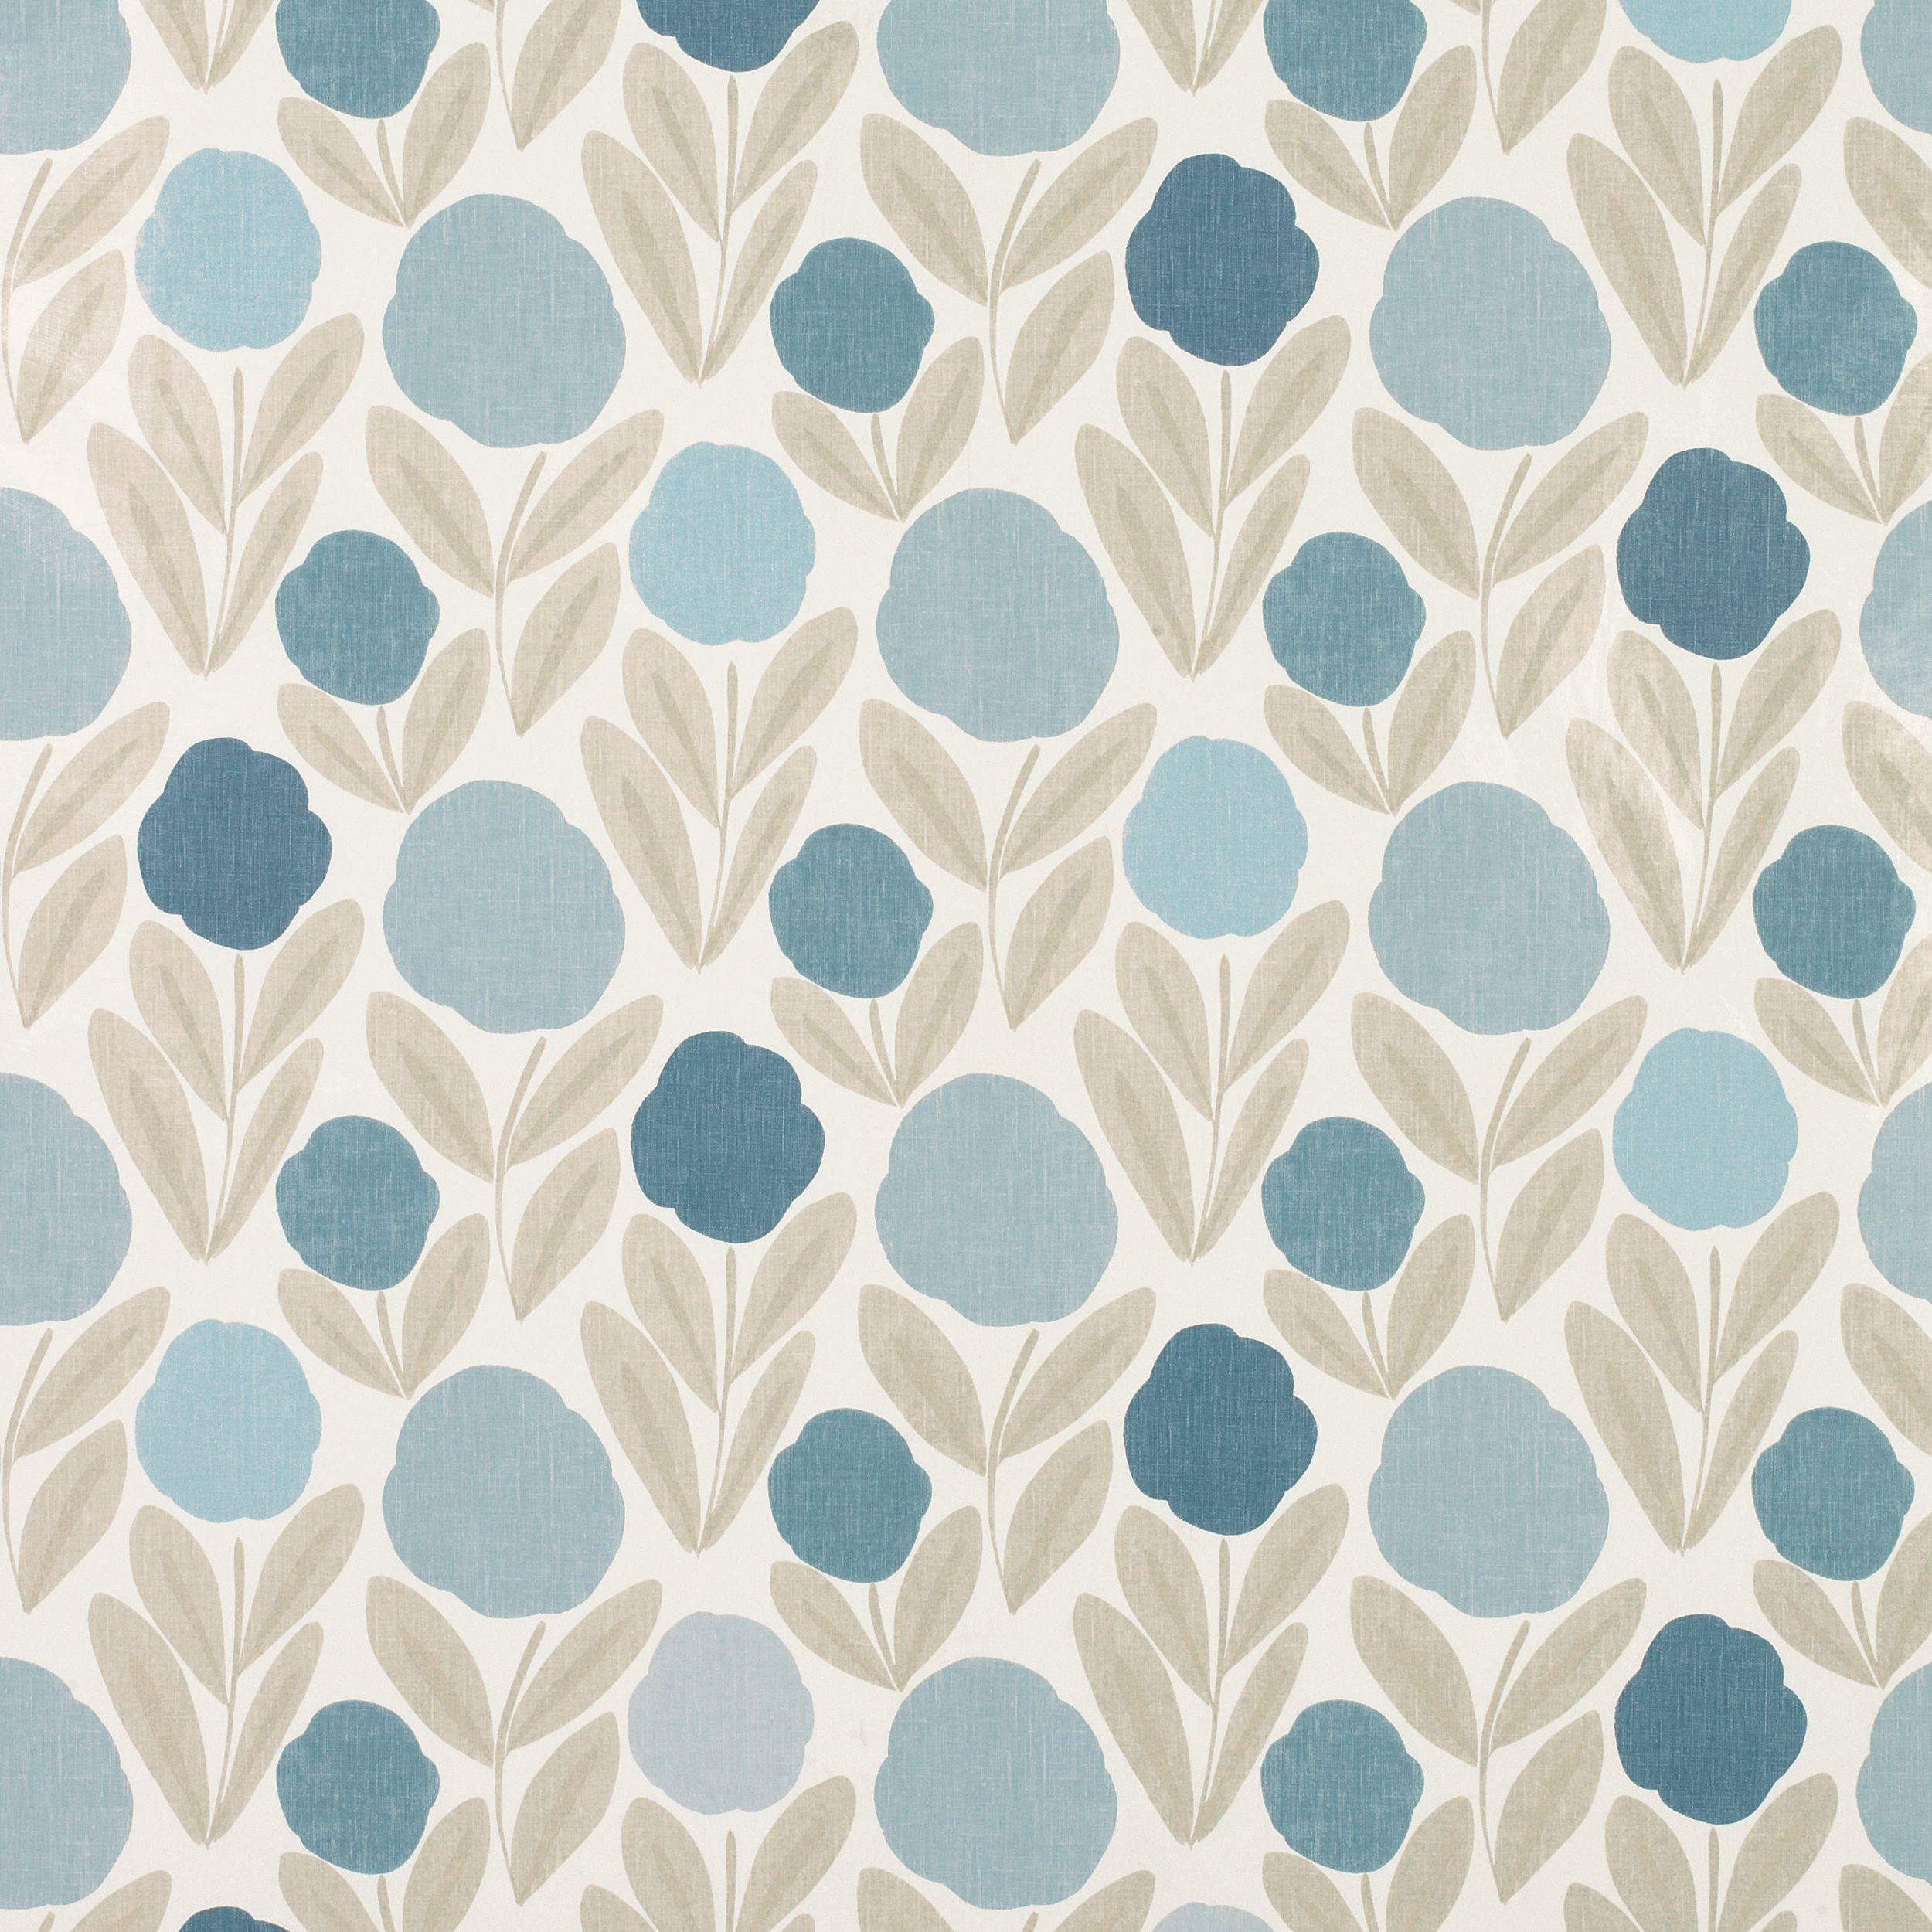 Laura Ashley Wallpaper Bedroom Serena Seaspray Natural Wallpaper At Laura Ashley Wall Paper